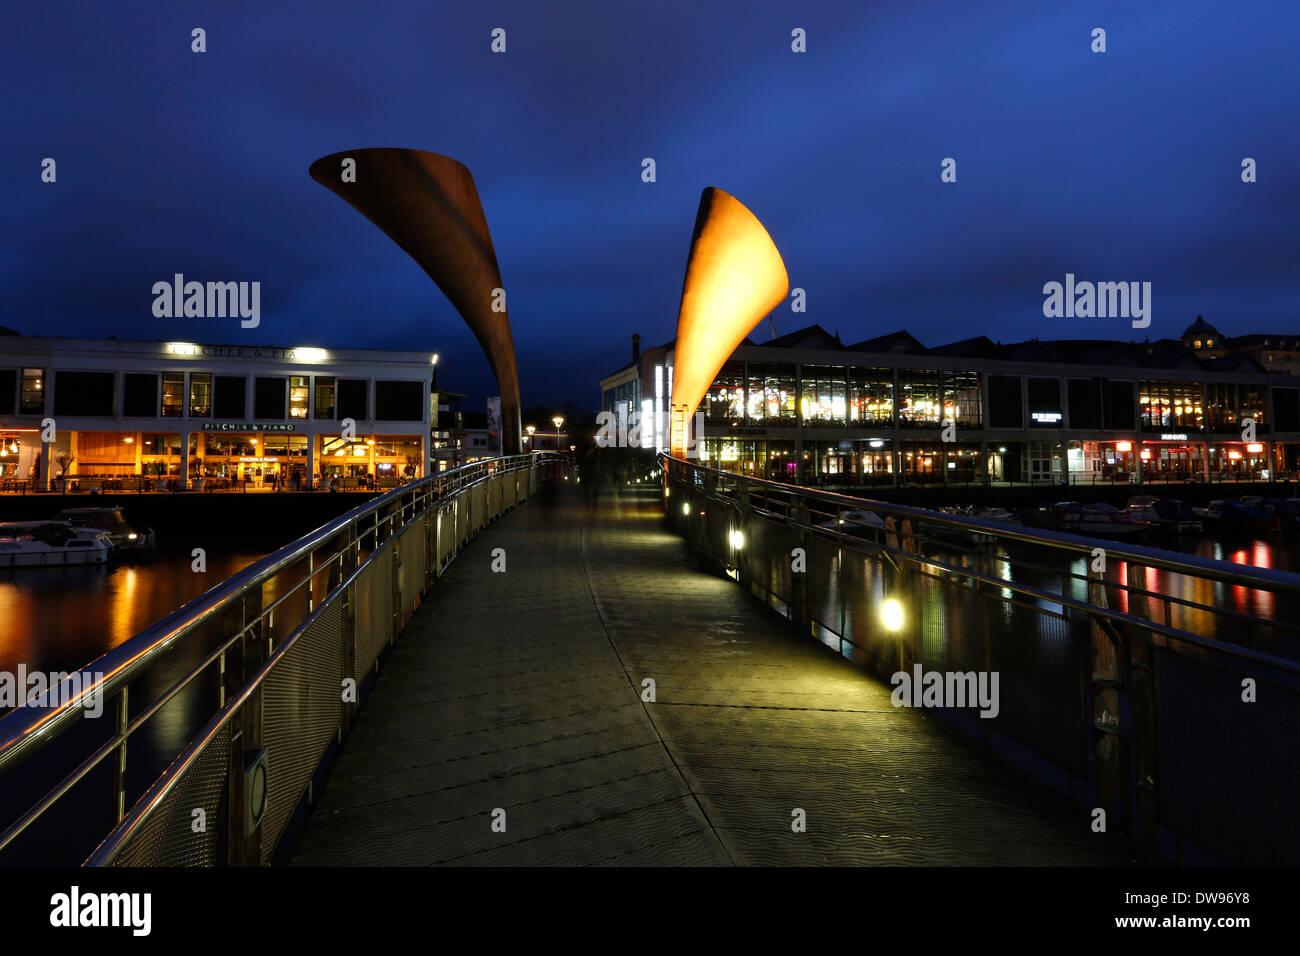 Pero's Bridge, spanning St. Augustine's Reach, Bristol, England, United Kingdom - Stock Image